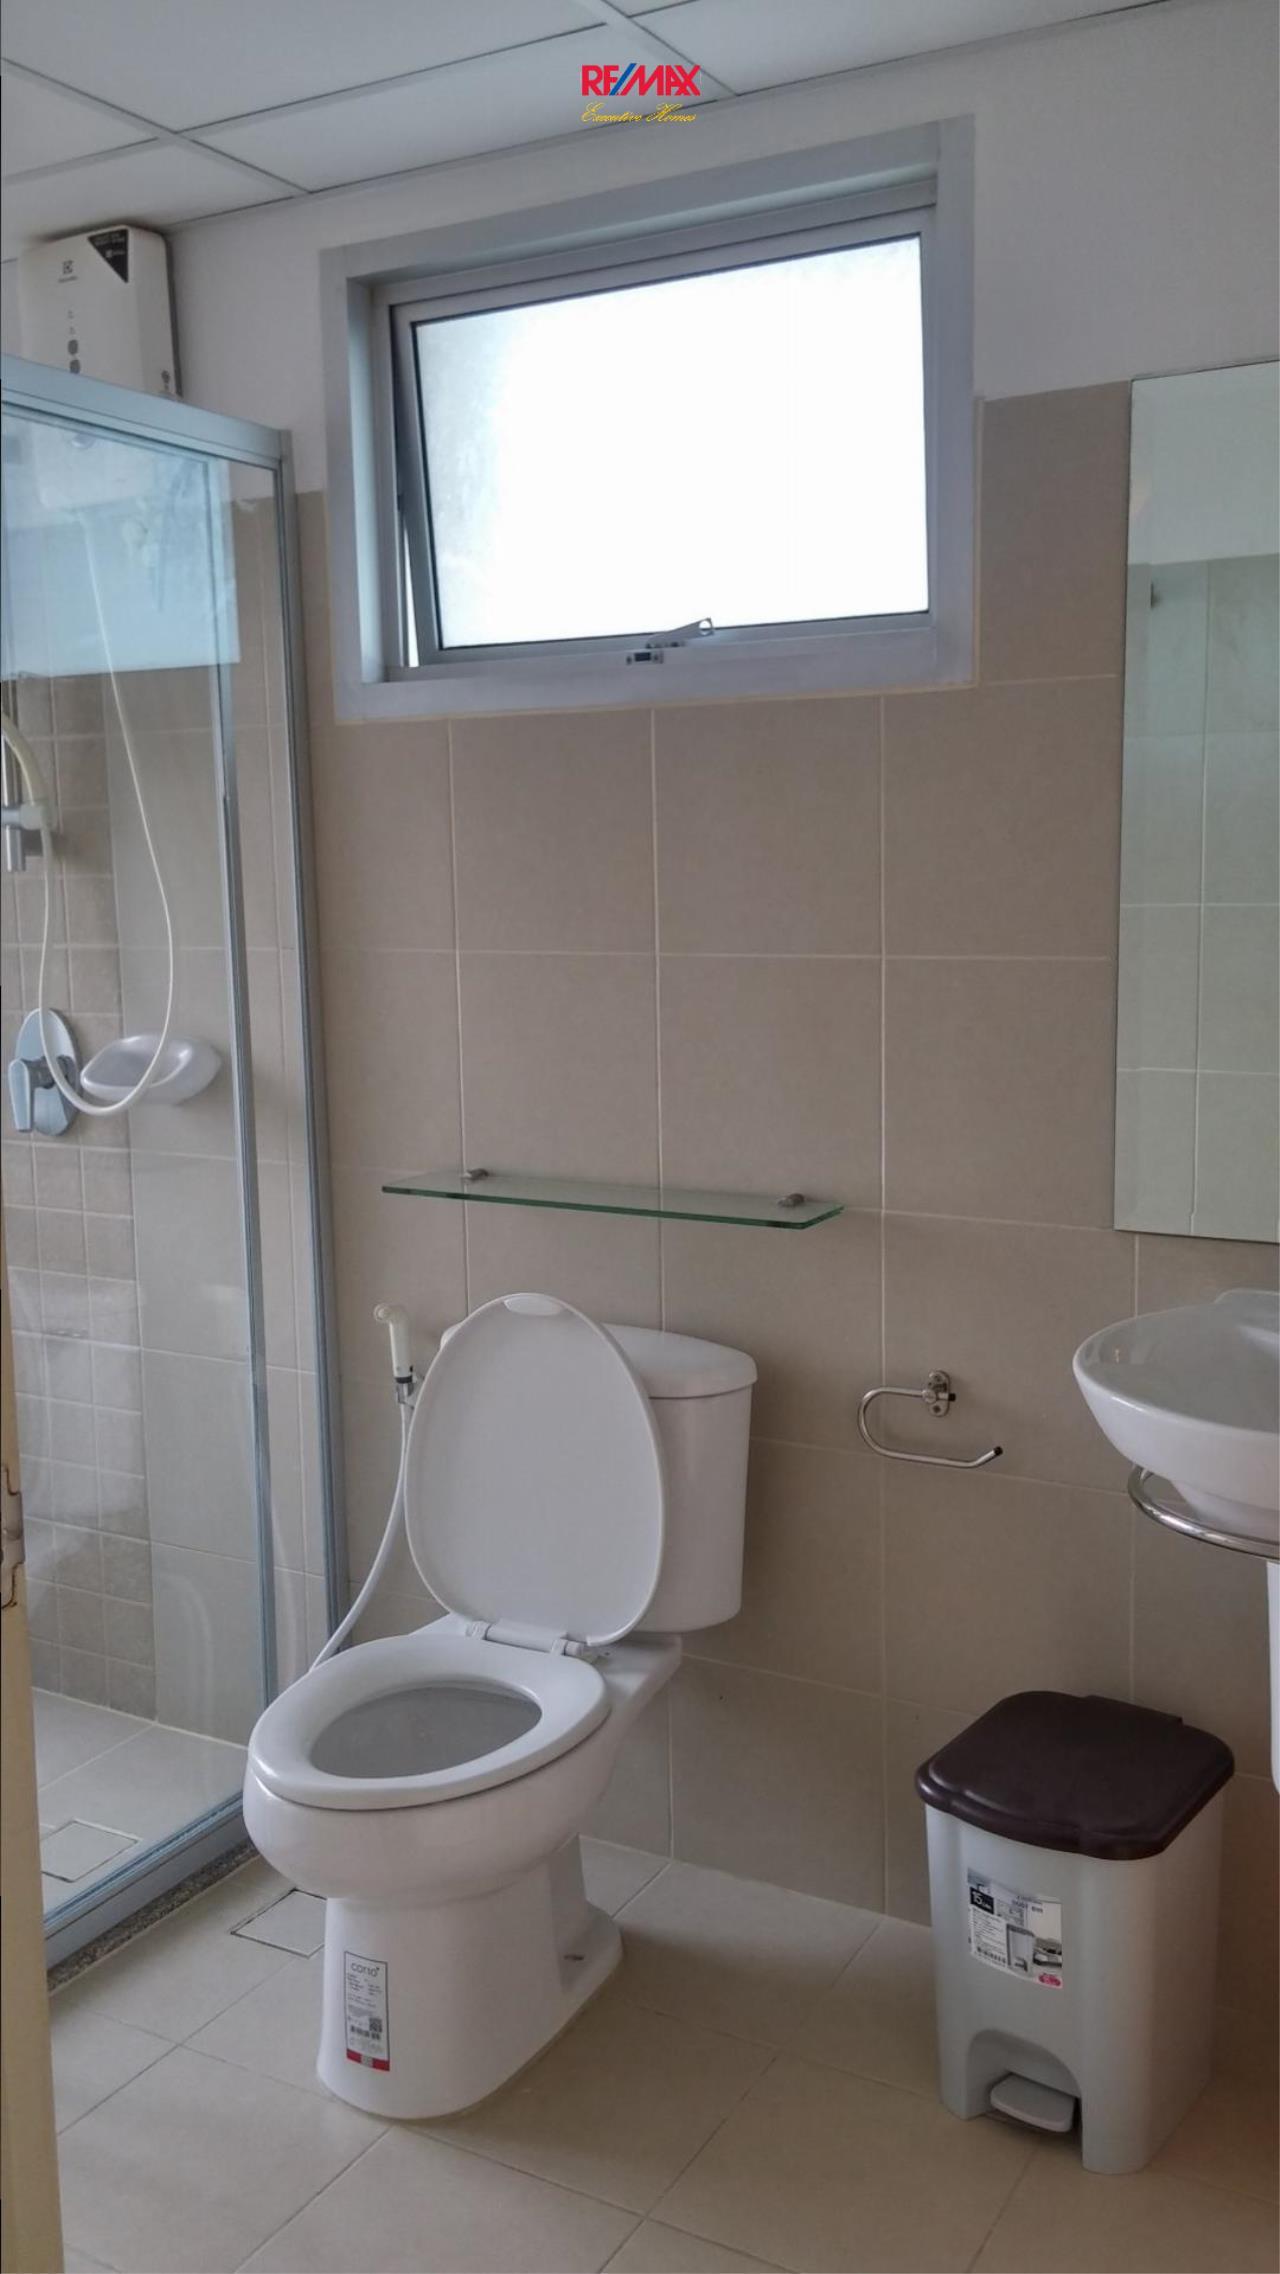 RE/MAX Executive Homes Agency's Nice 2 Bedroom for Rent Supalai Park Ekamai Thonglor 3